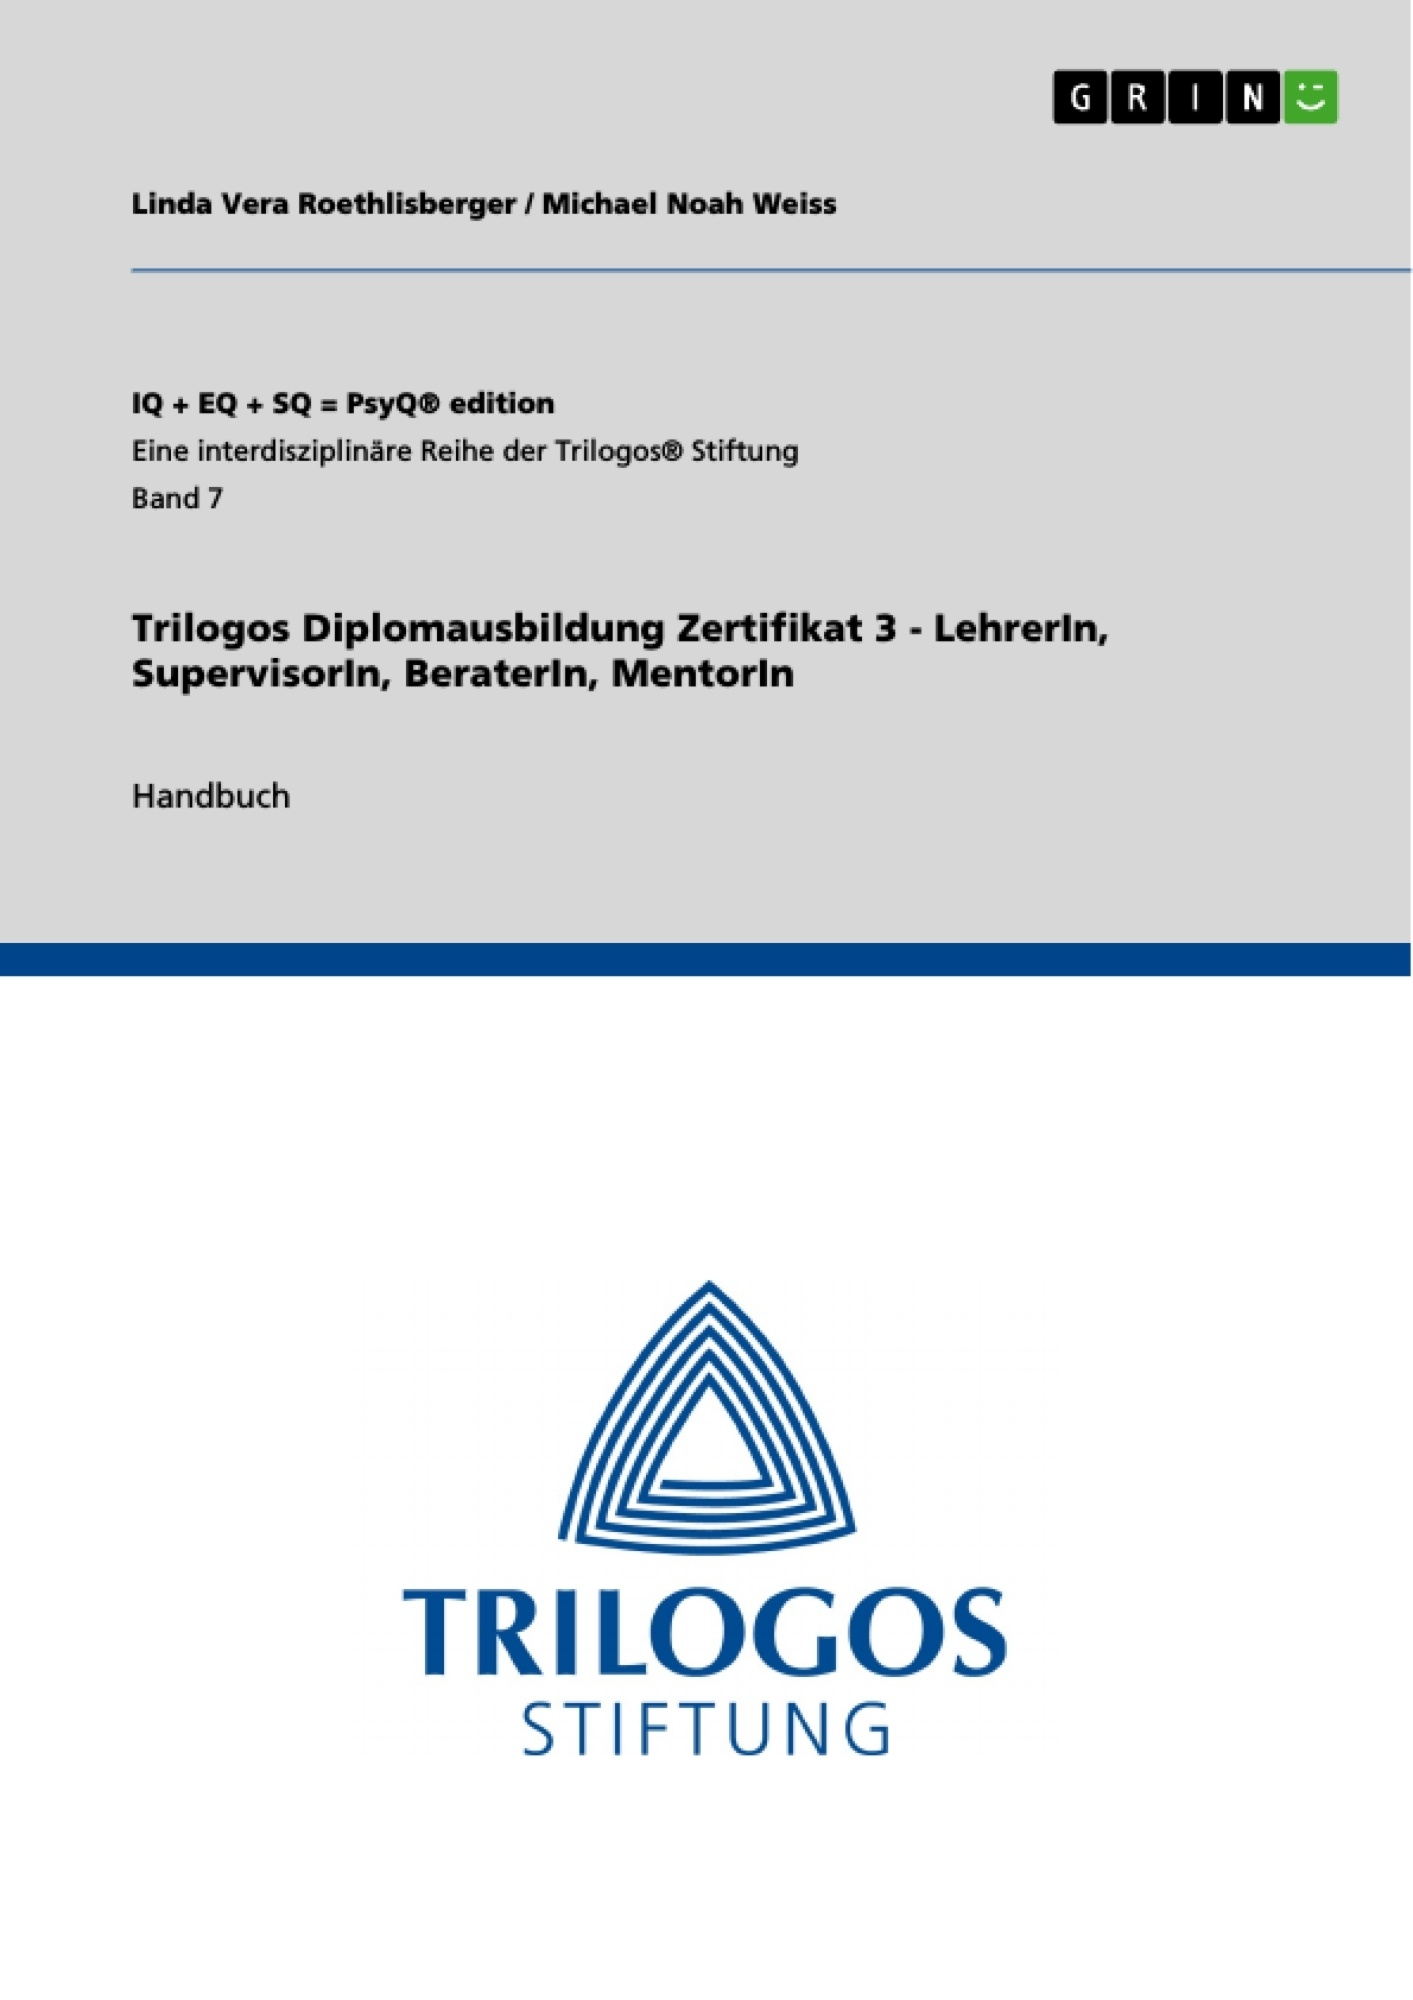 Titel: Trilogos Diplomausbildung Zertifikat 3 - LehrerIn, SupervisorIn, BeraterIn, MentorIn